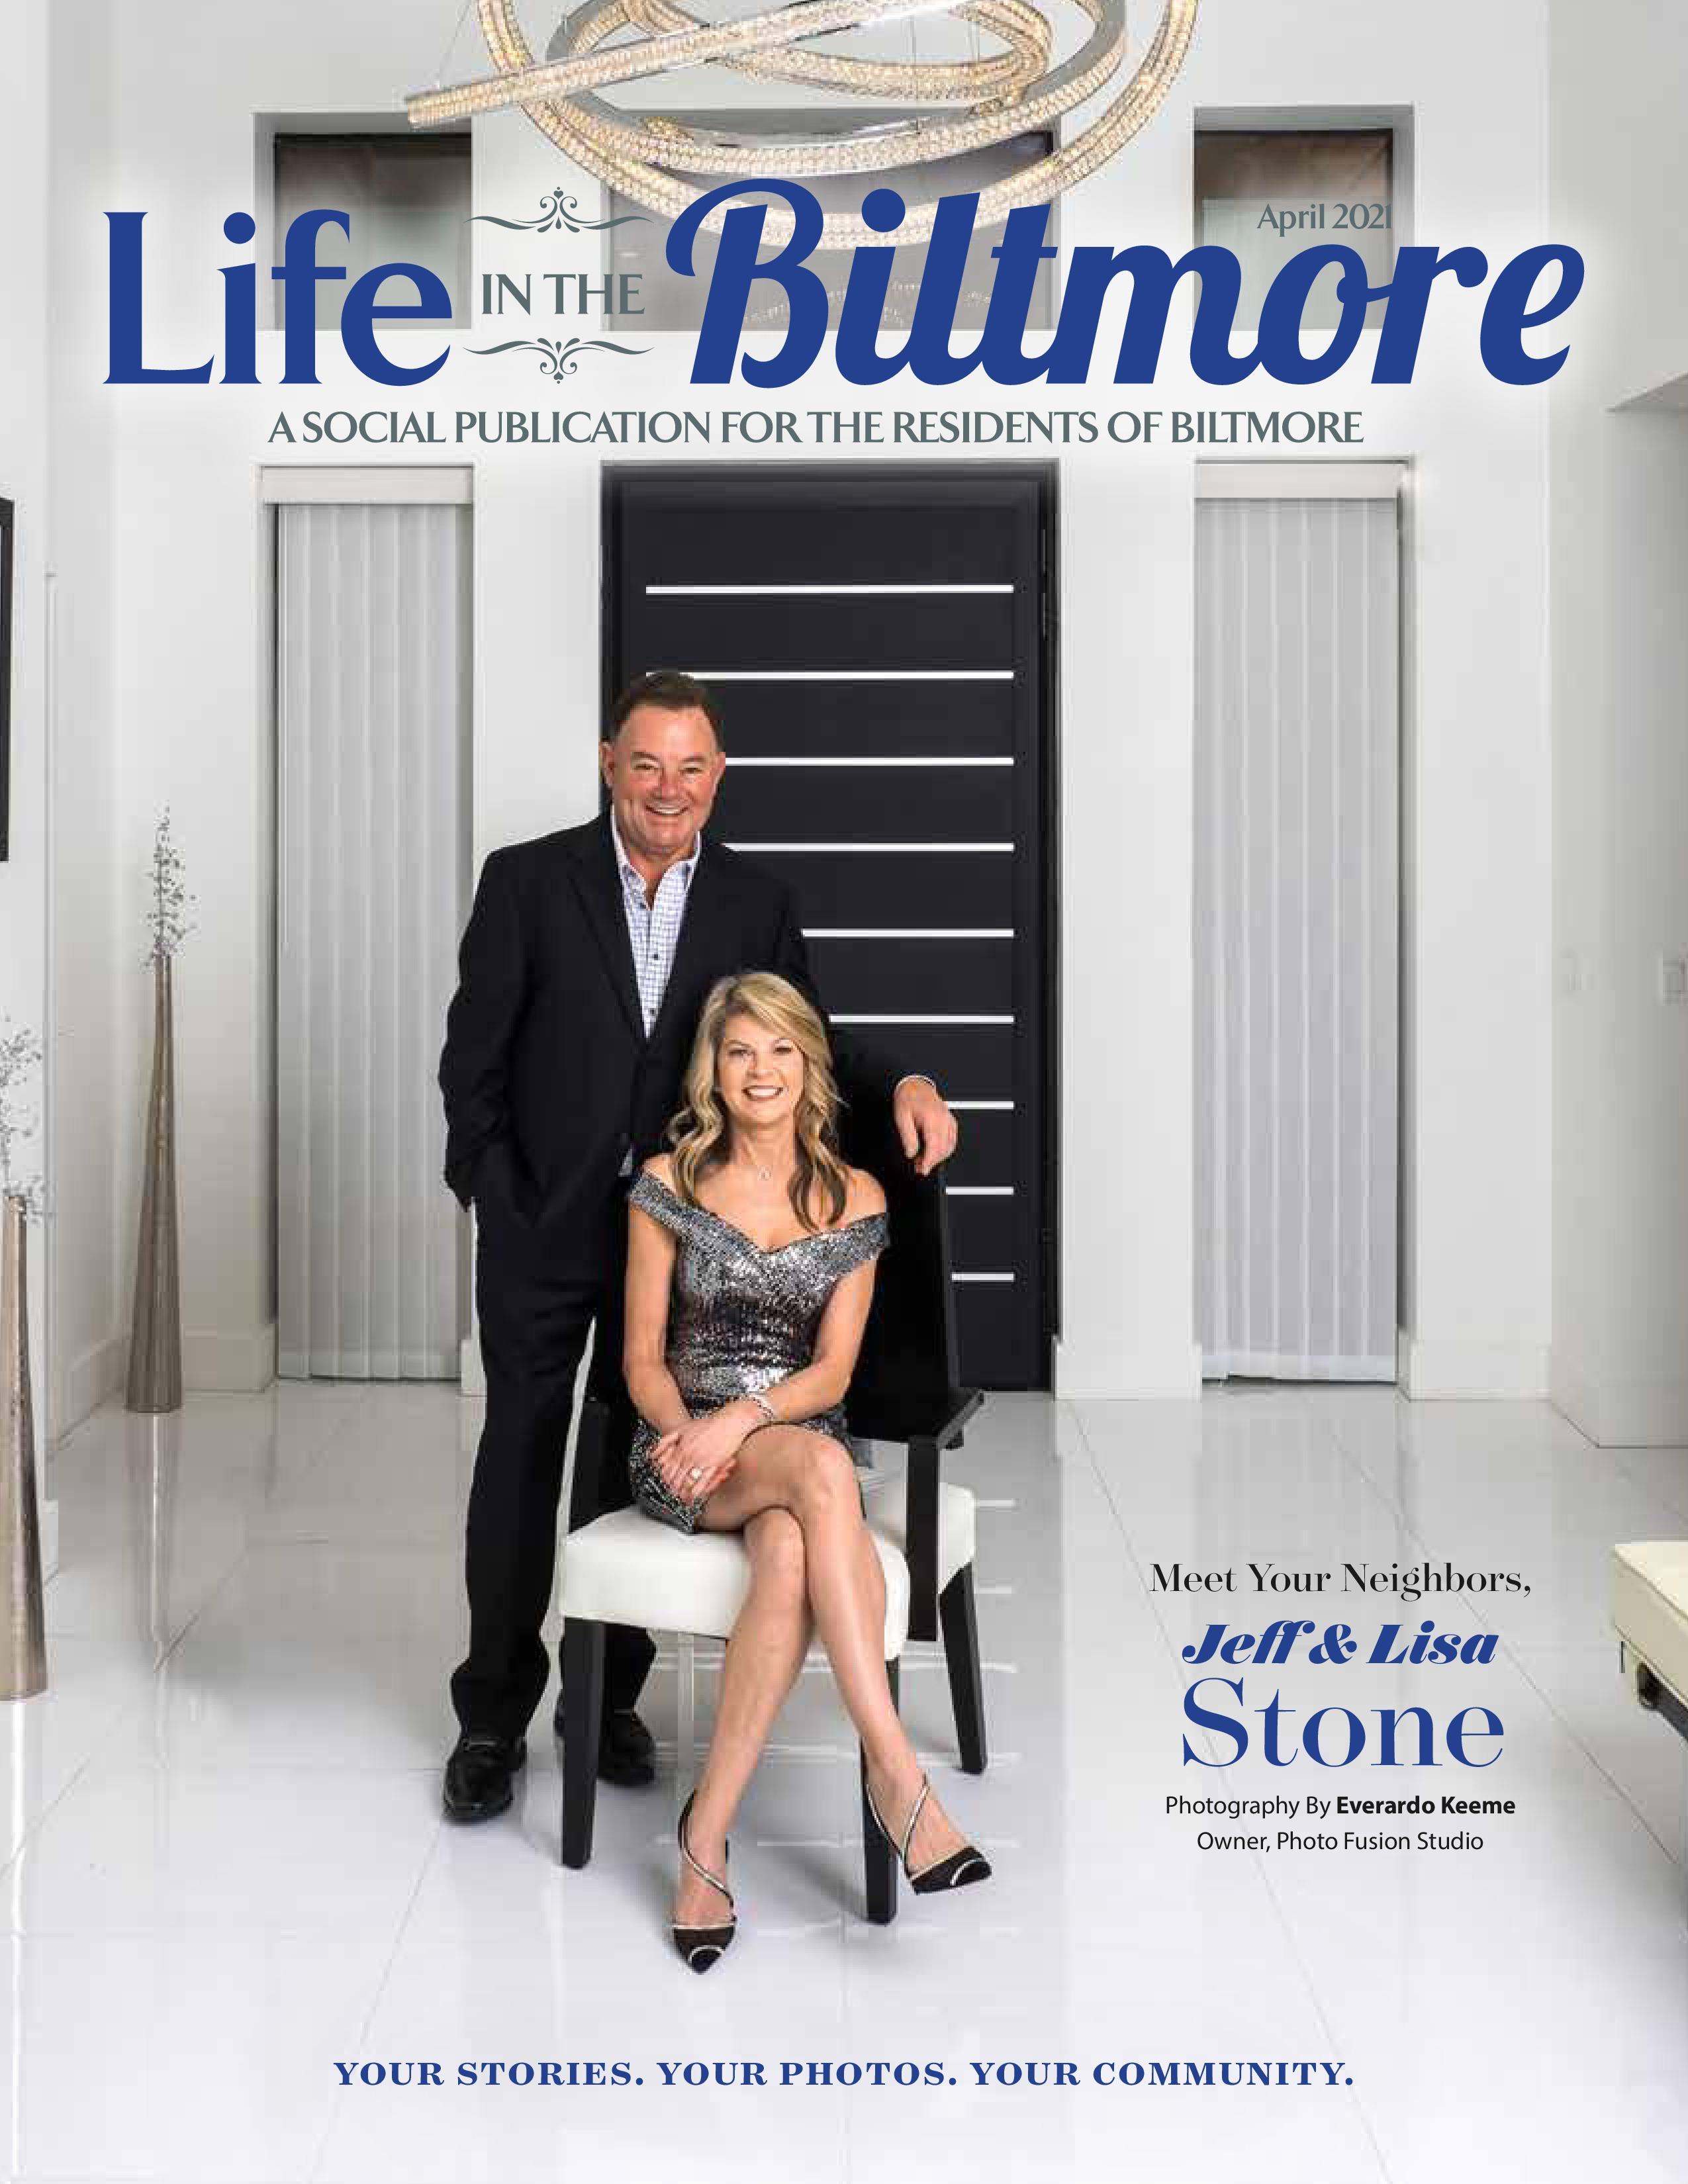 Life in the Biltmore 2021-04-01